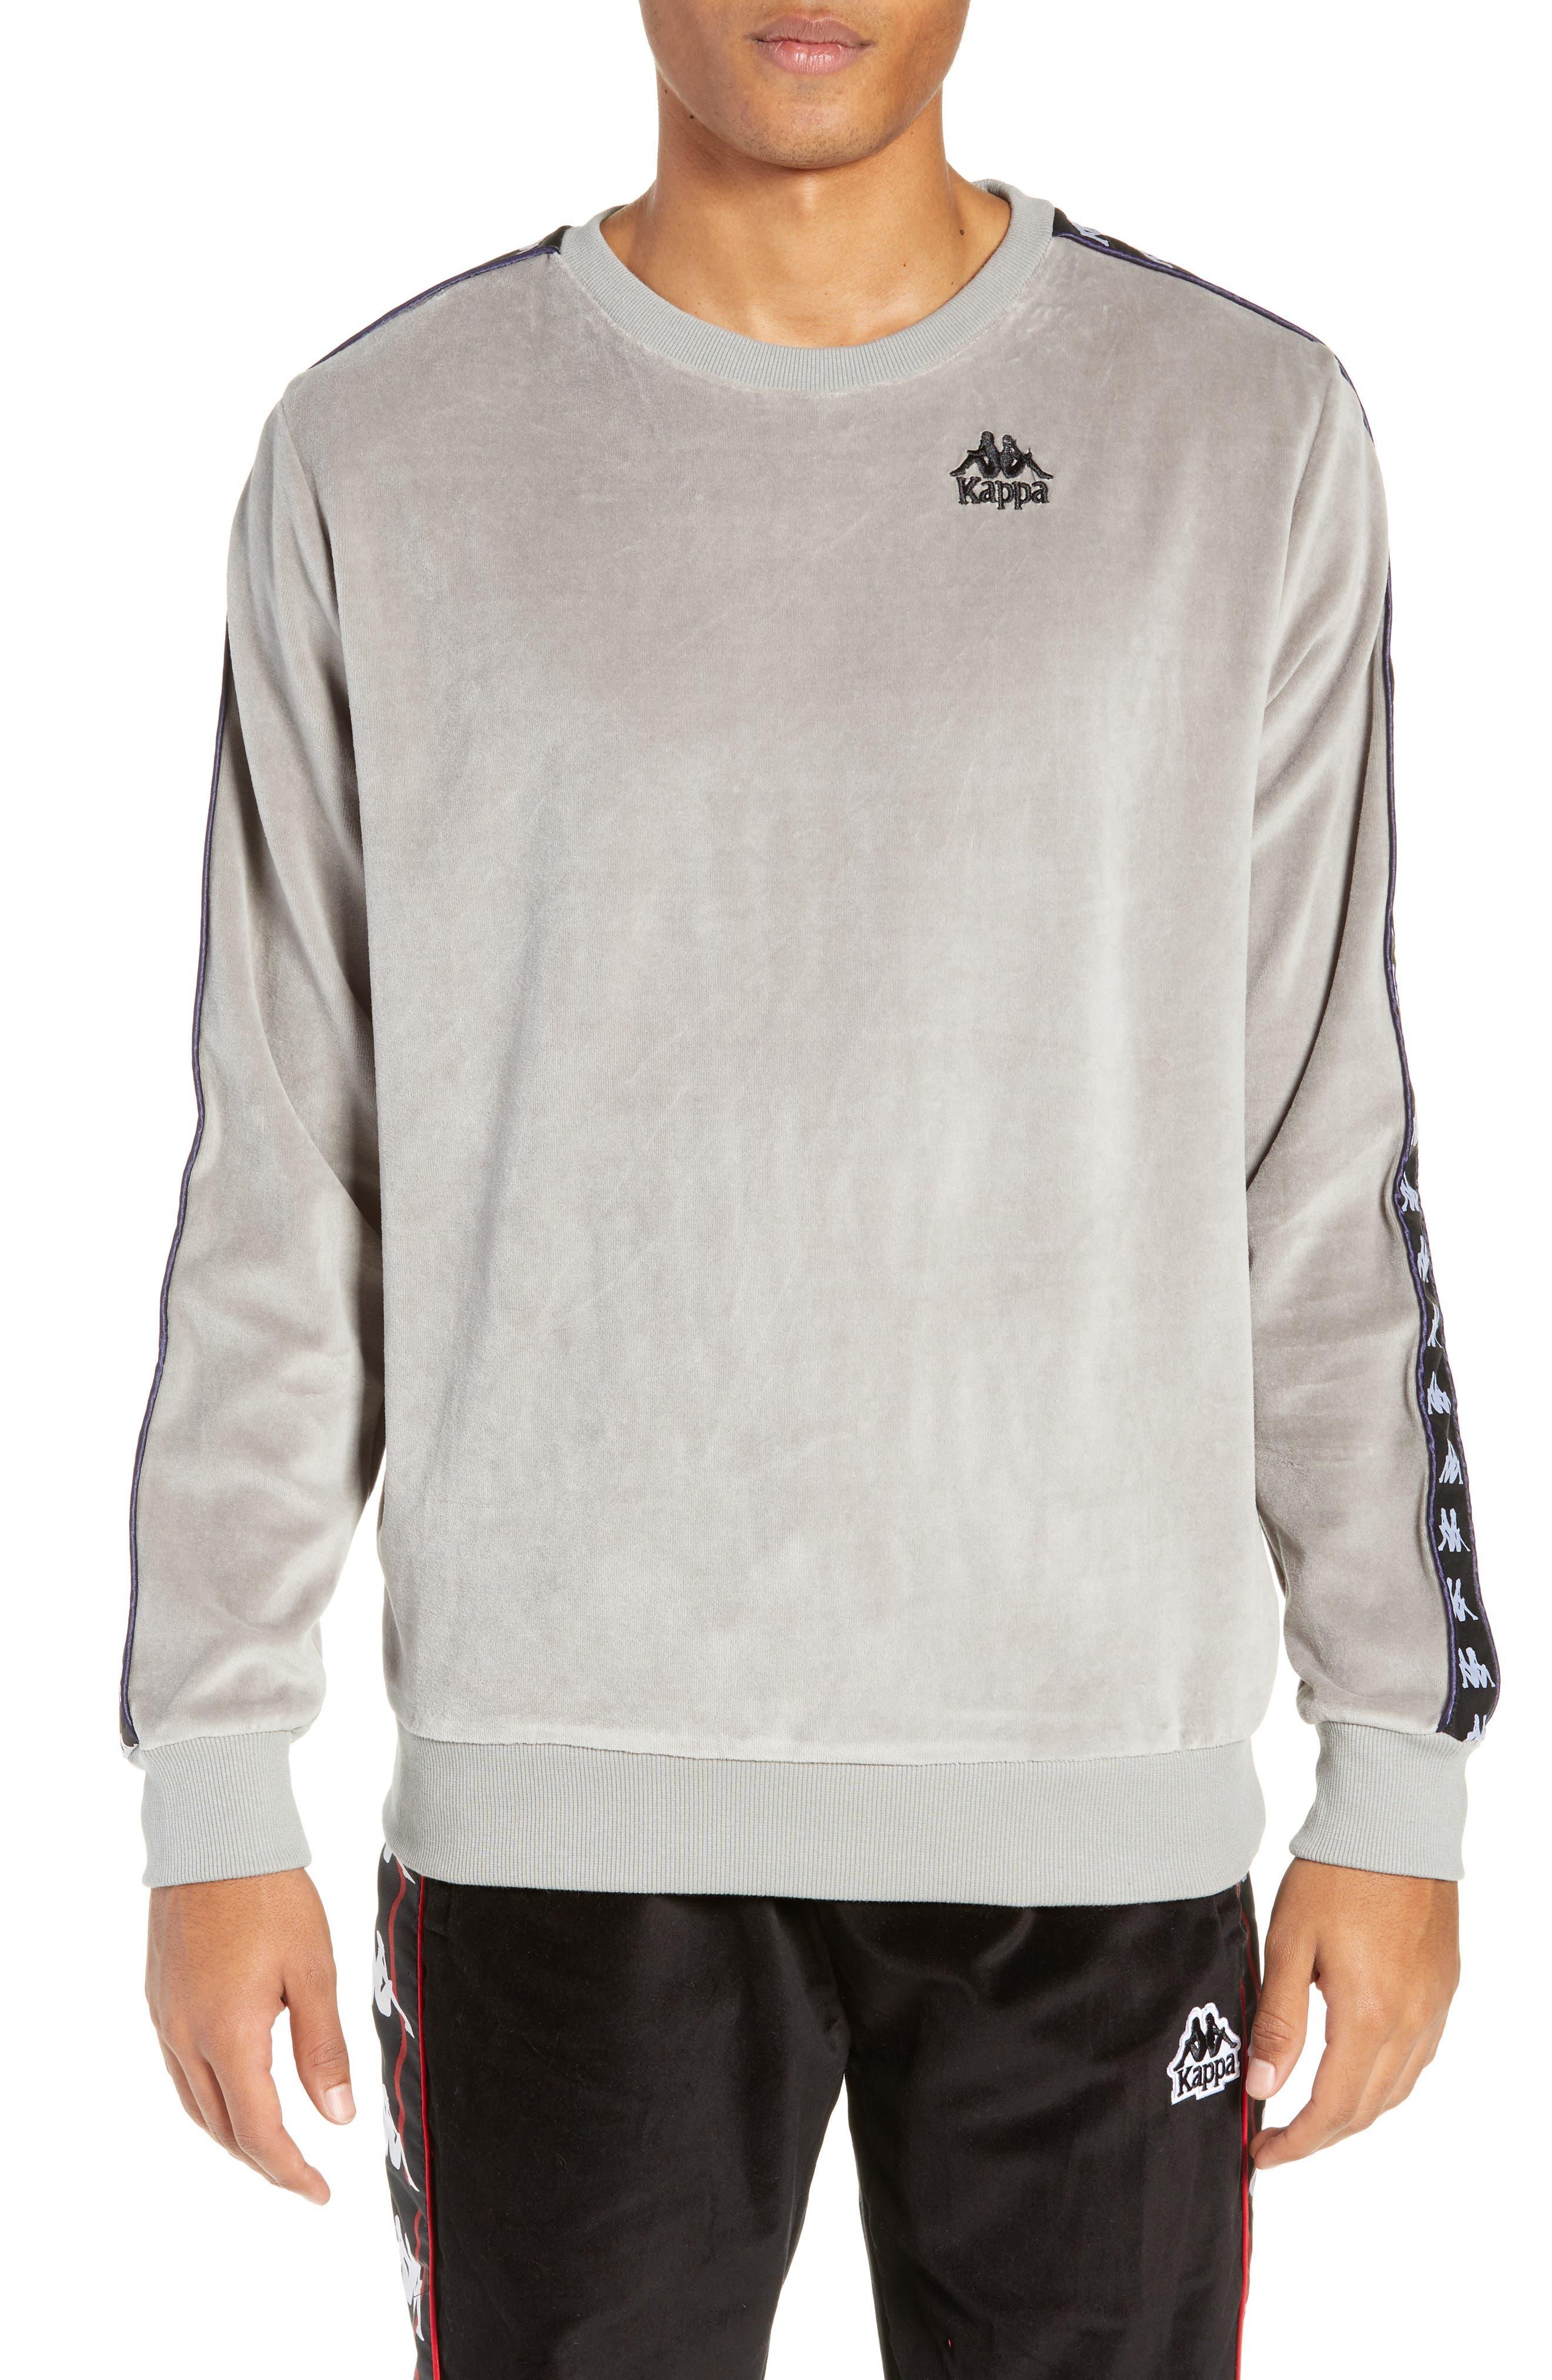 Authentic Aynset Velour Crewneck Sweatshirt,                         Main,                         color, GREY MIST/ BLACK/ WHITE